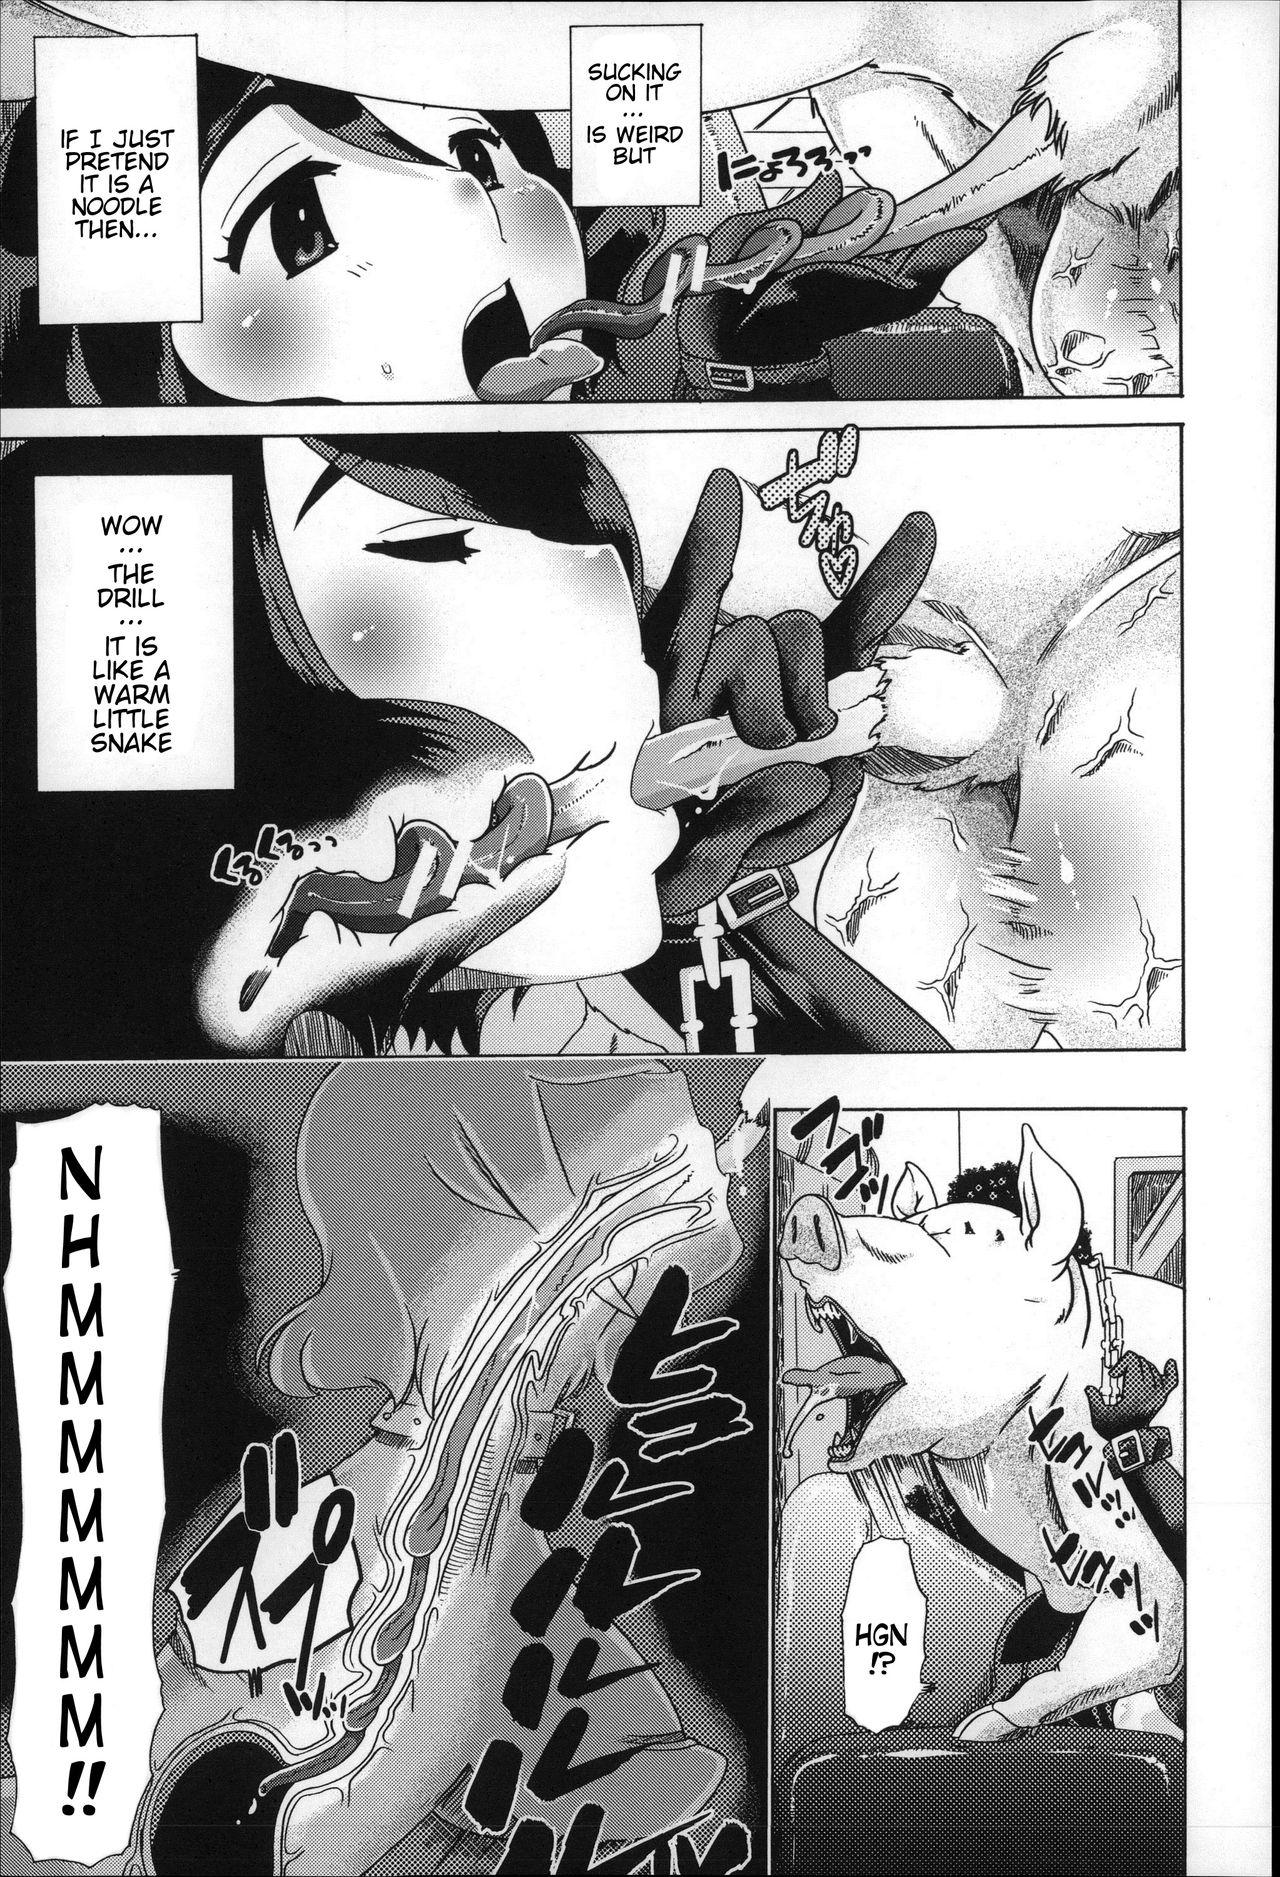 [Chikiko] Juukan - Tonkatsu   Bestiality - Pork Life (Cutlet) (Juukan Nikubenki Kasumi) [English] [Neeko7] 10